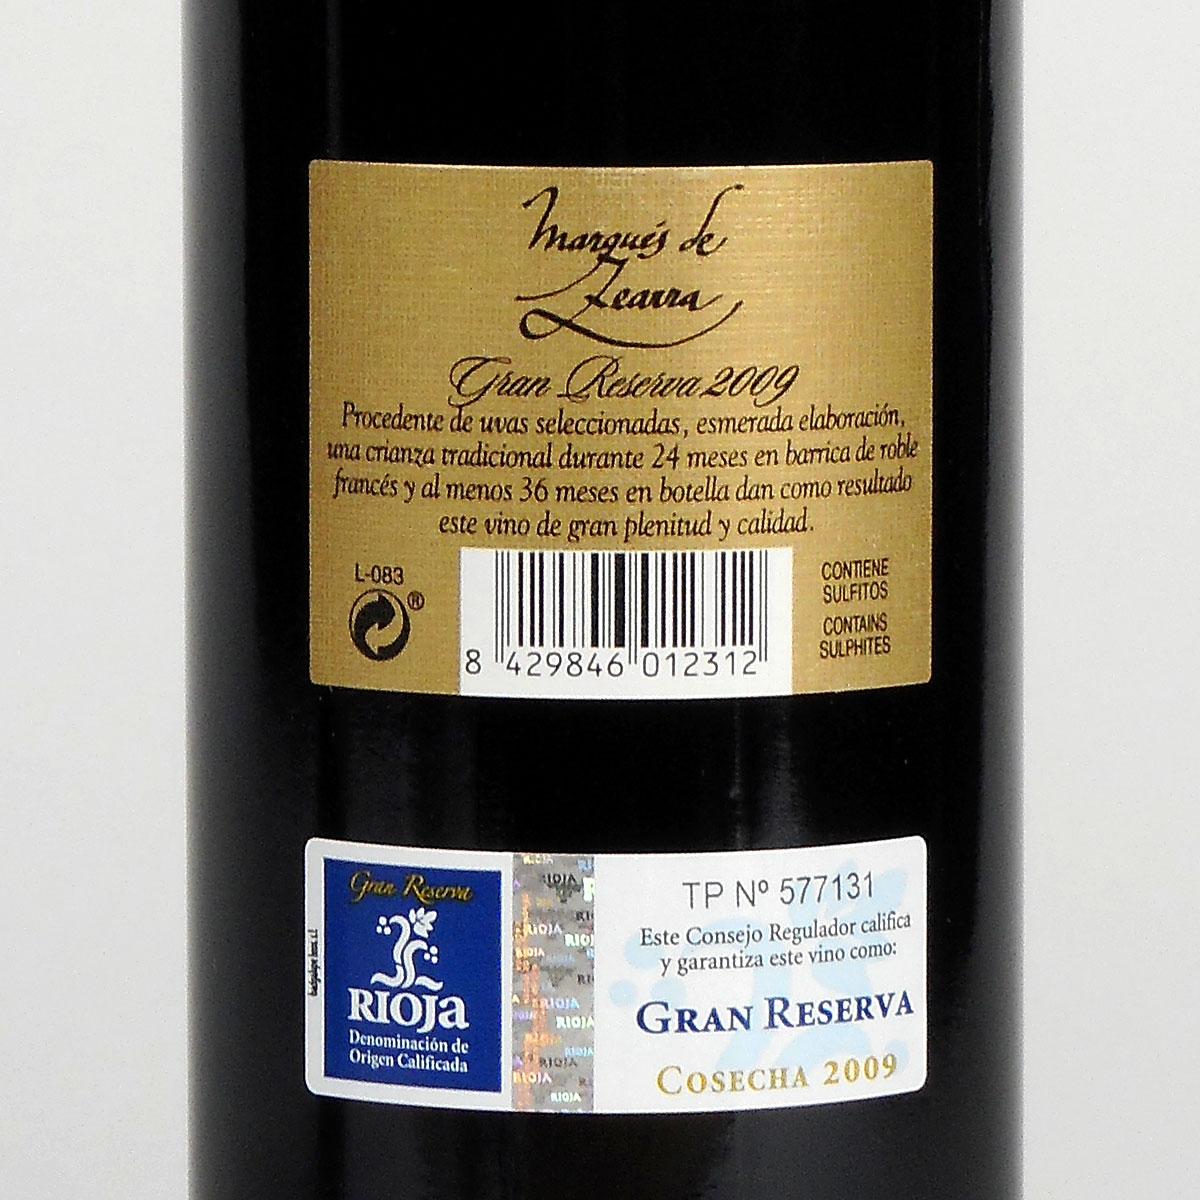 Rioja: Marqués de Zearra Gran Reserva 2009 - Bottle Rear Label